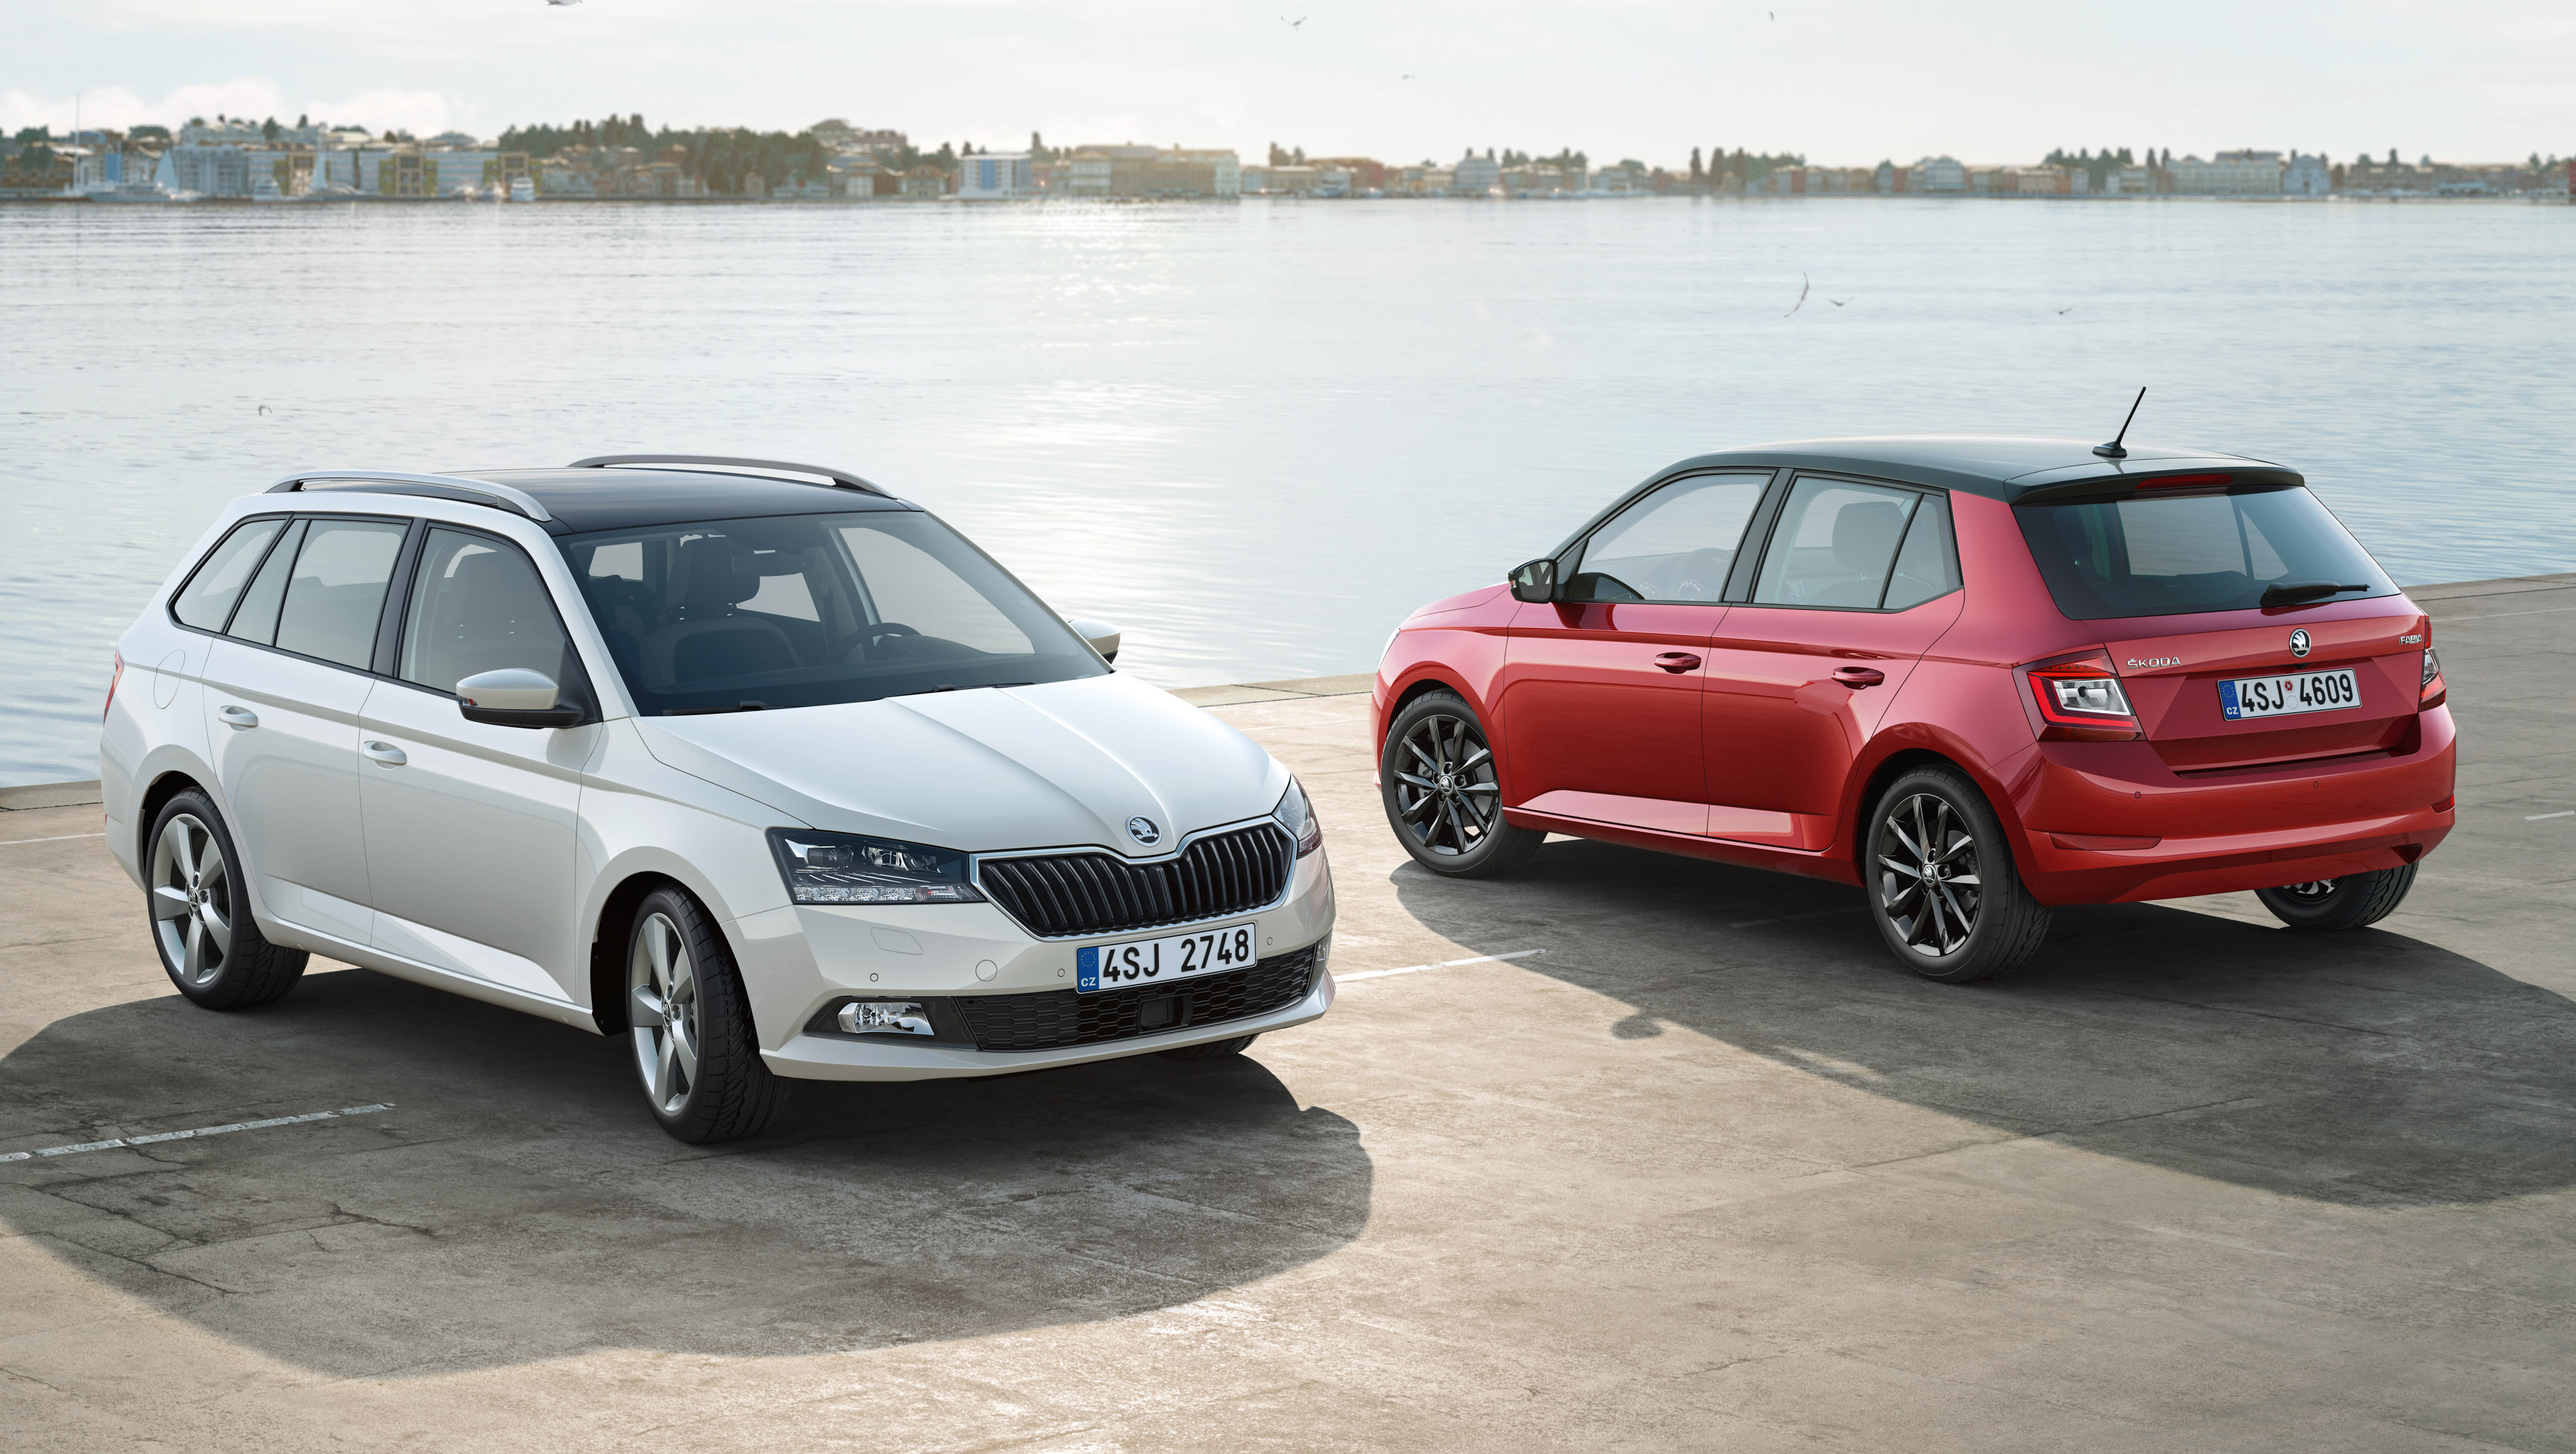 Skoda Fabia 2019 pricing and specs revealed - Car News ...